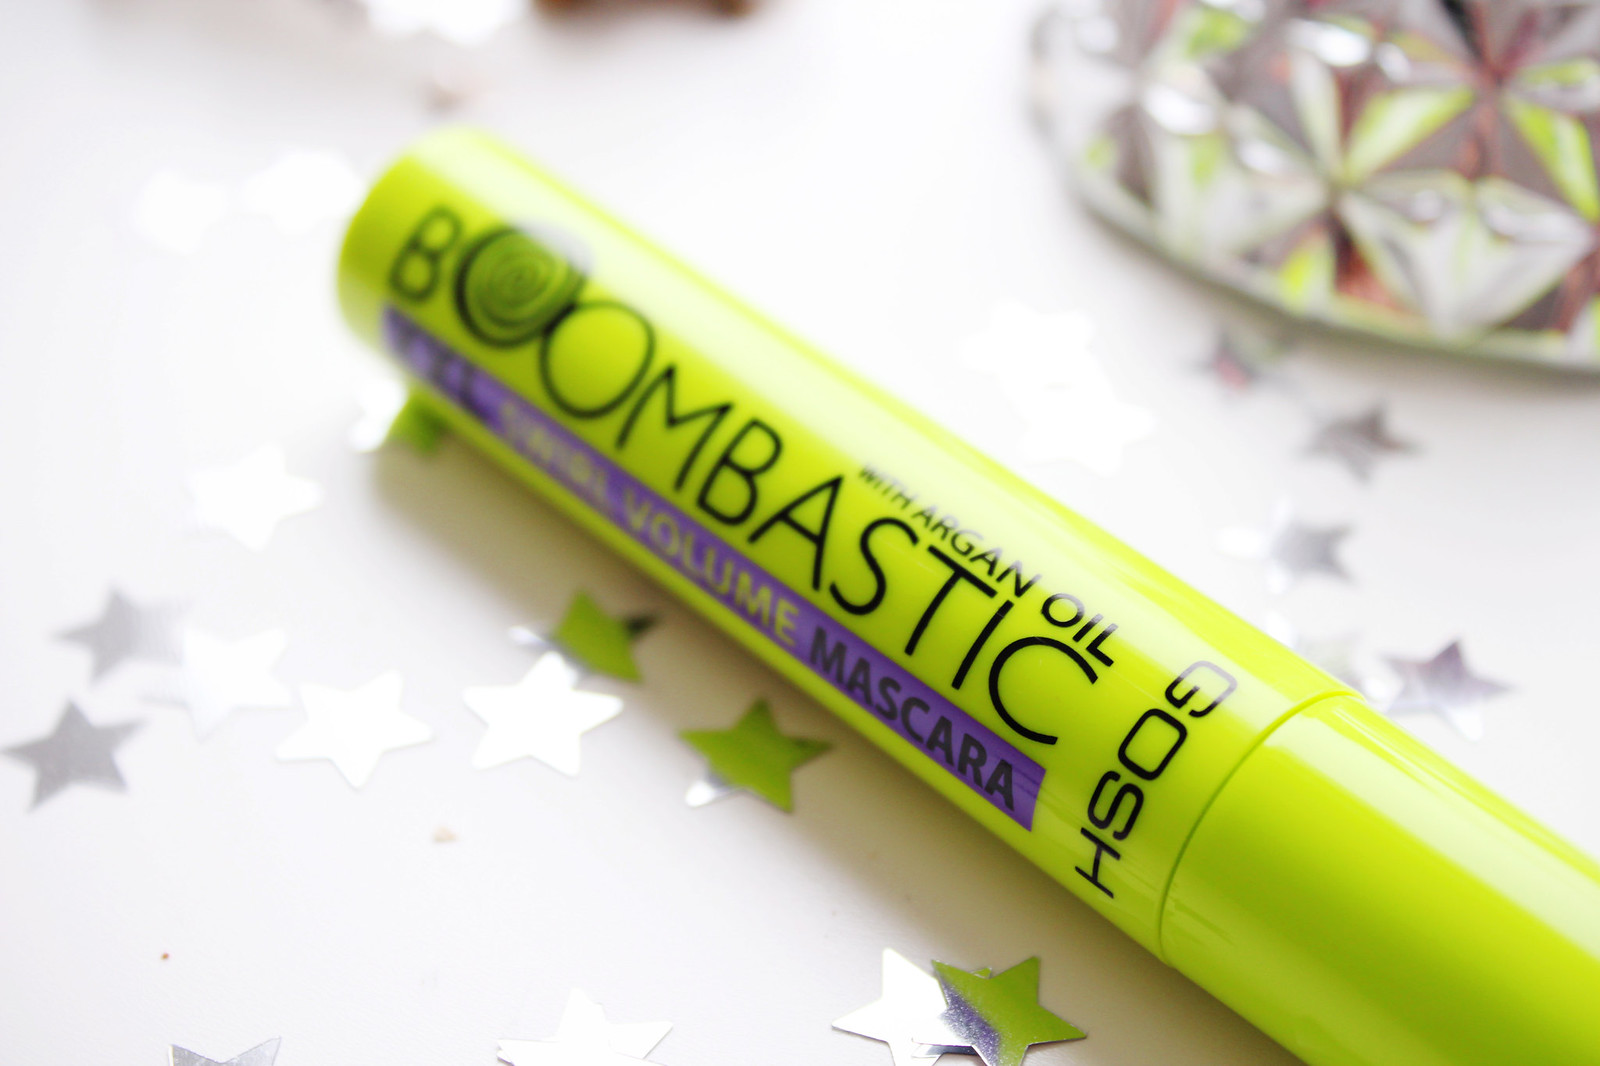 GOSH Boomnbastic mascara review